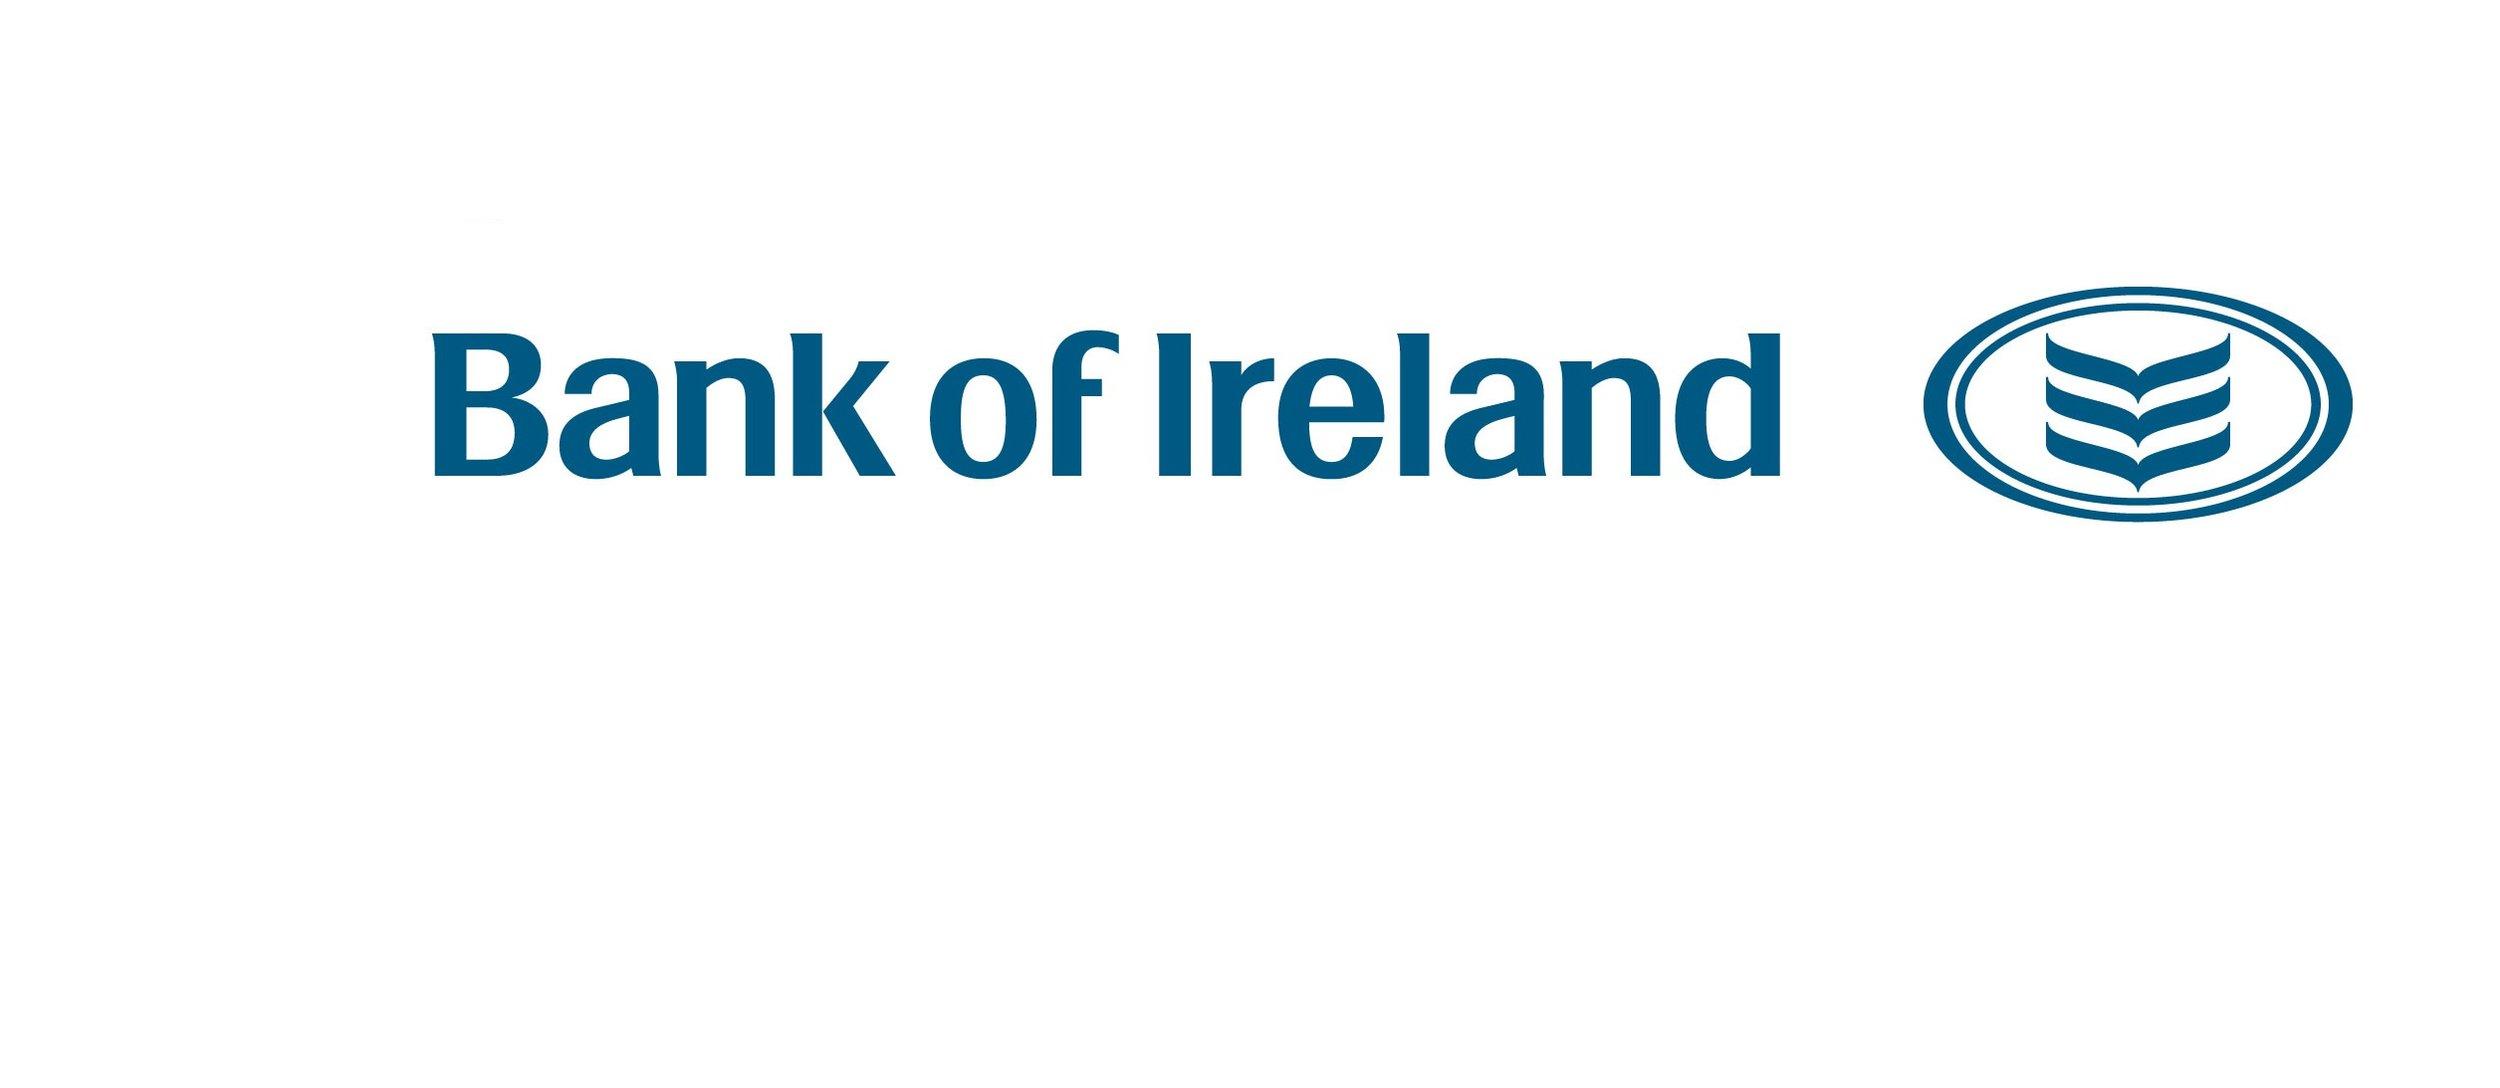 2265124-bank-of-ireland-logo.jpg